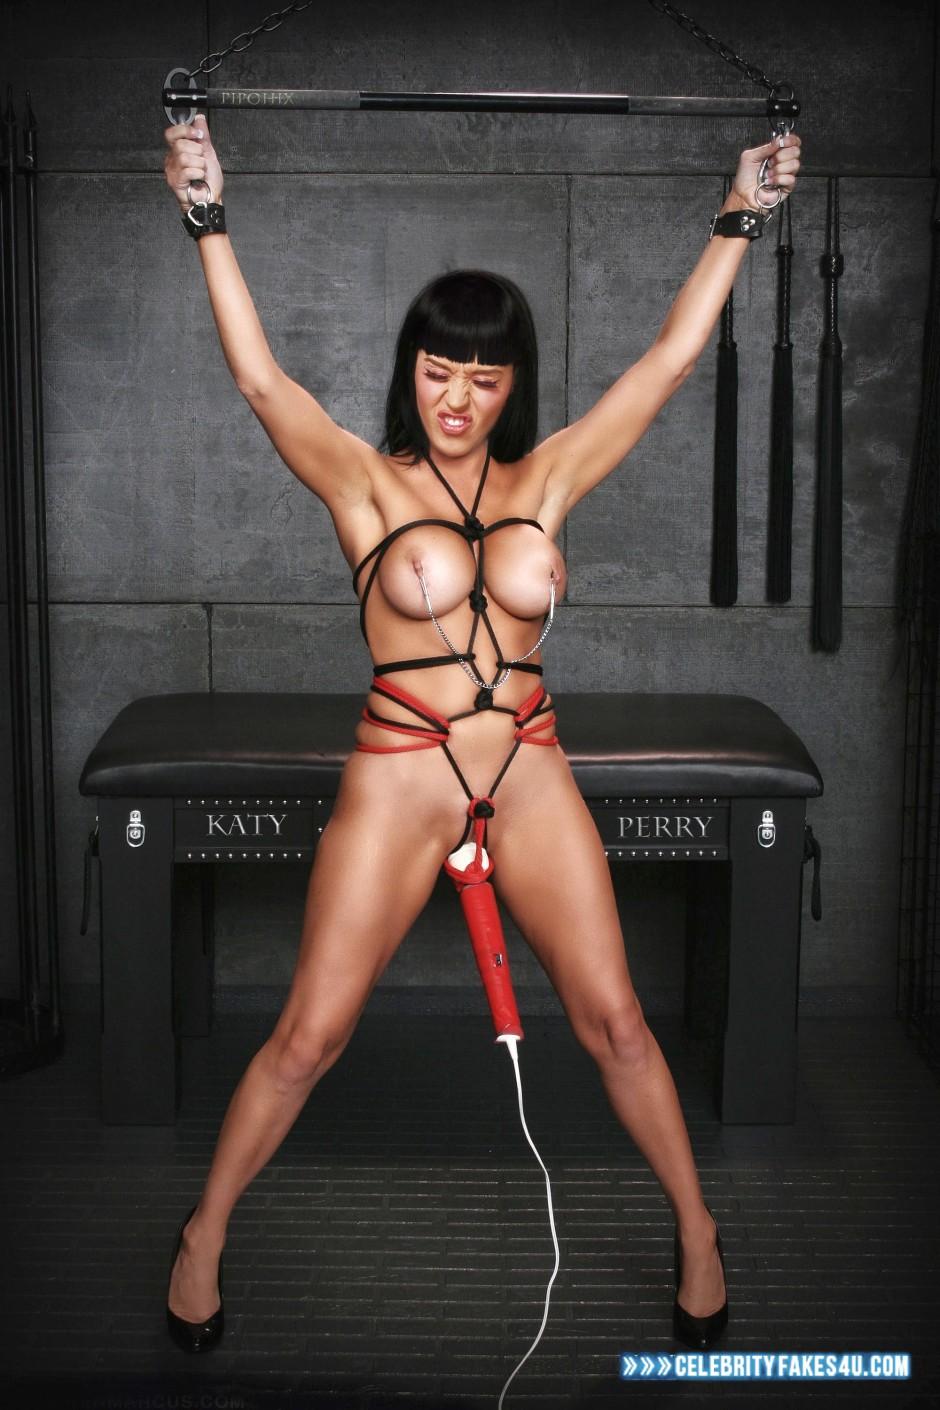 Nude fakes perry katy Deepfake Porn